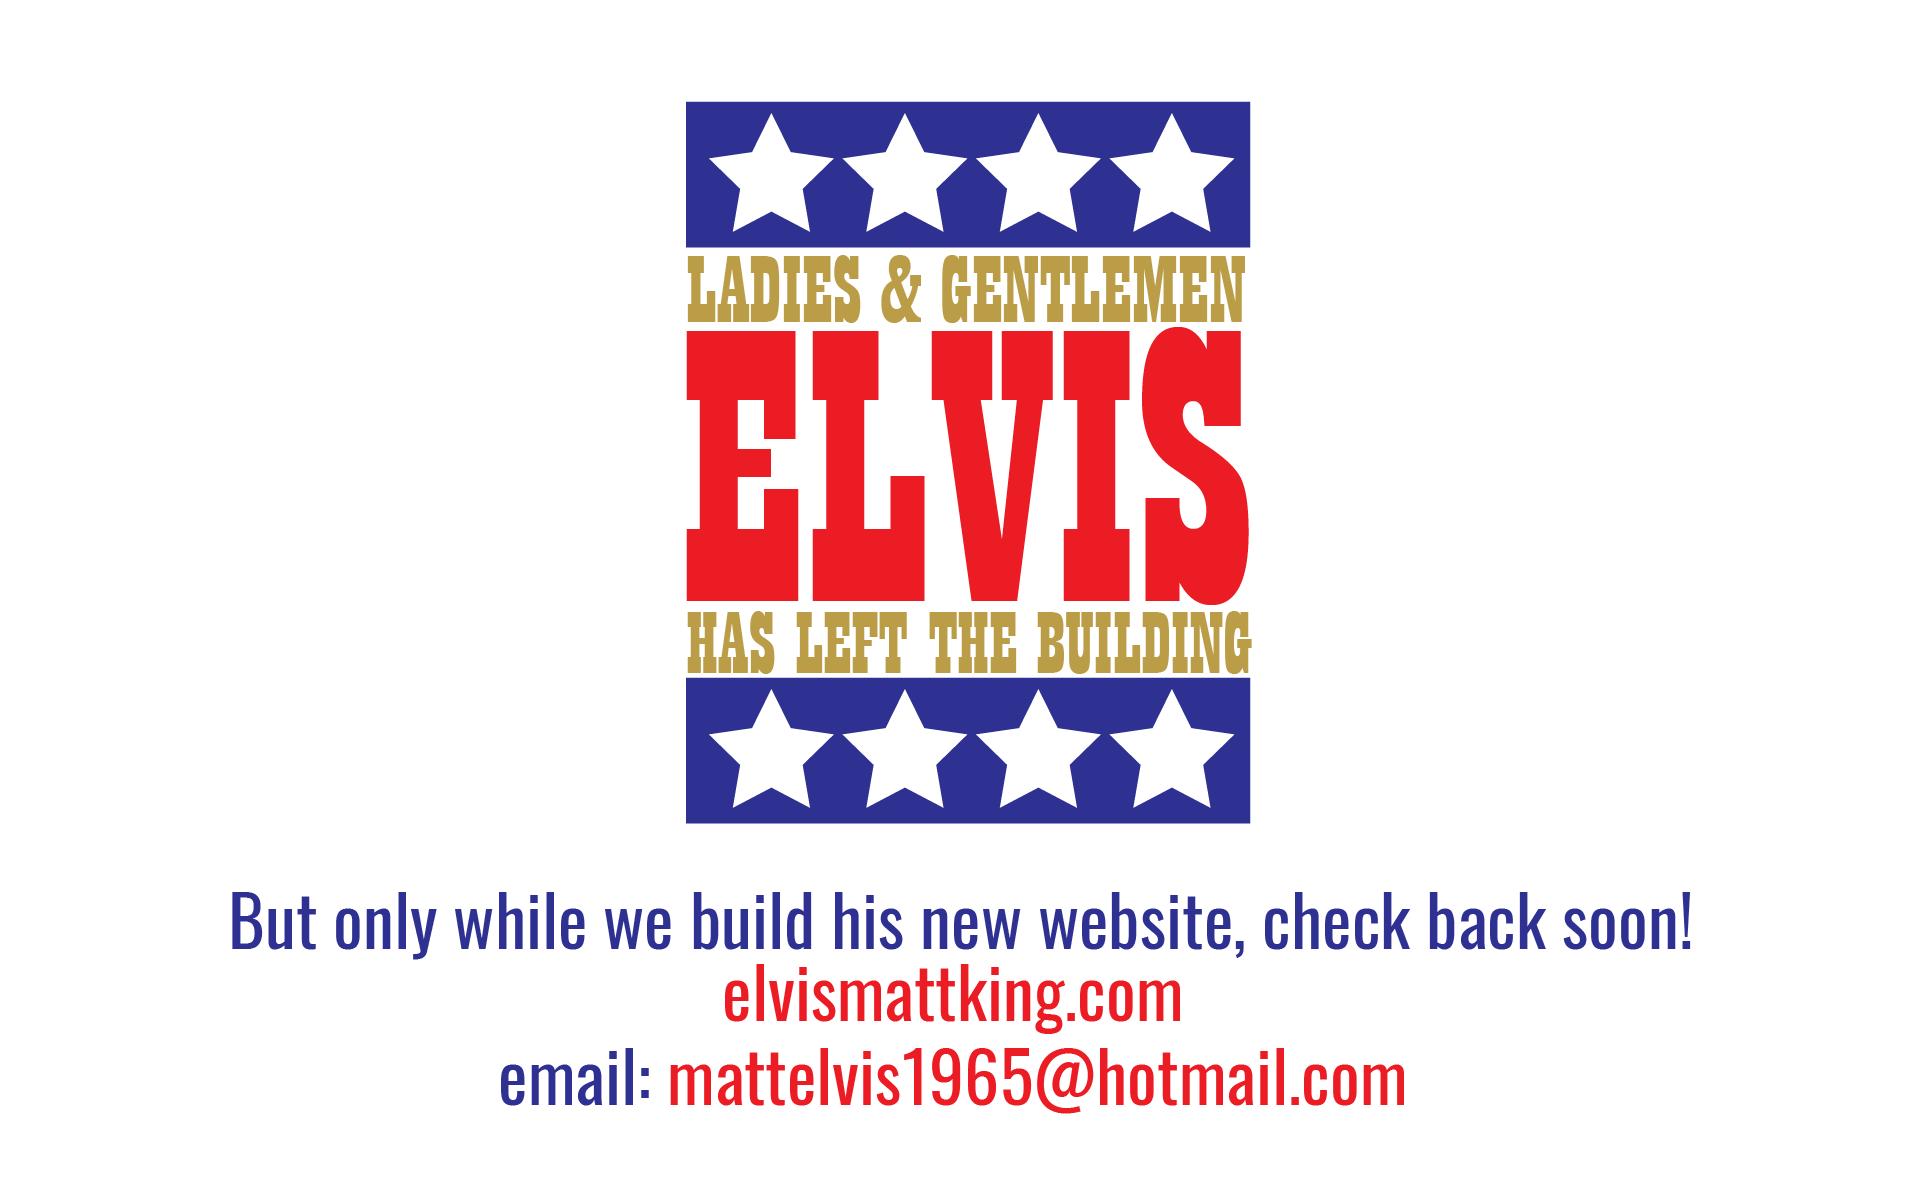 http://elvismattking.com/wp-content/uploads/2018/06/elvis-has-left-email_1.png